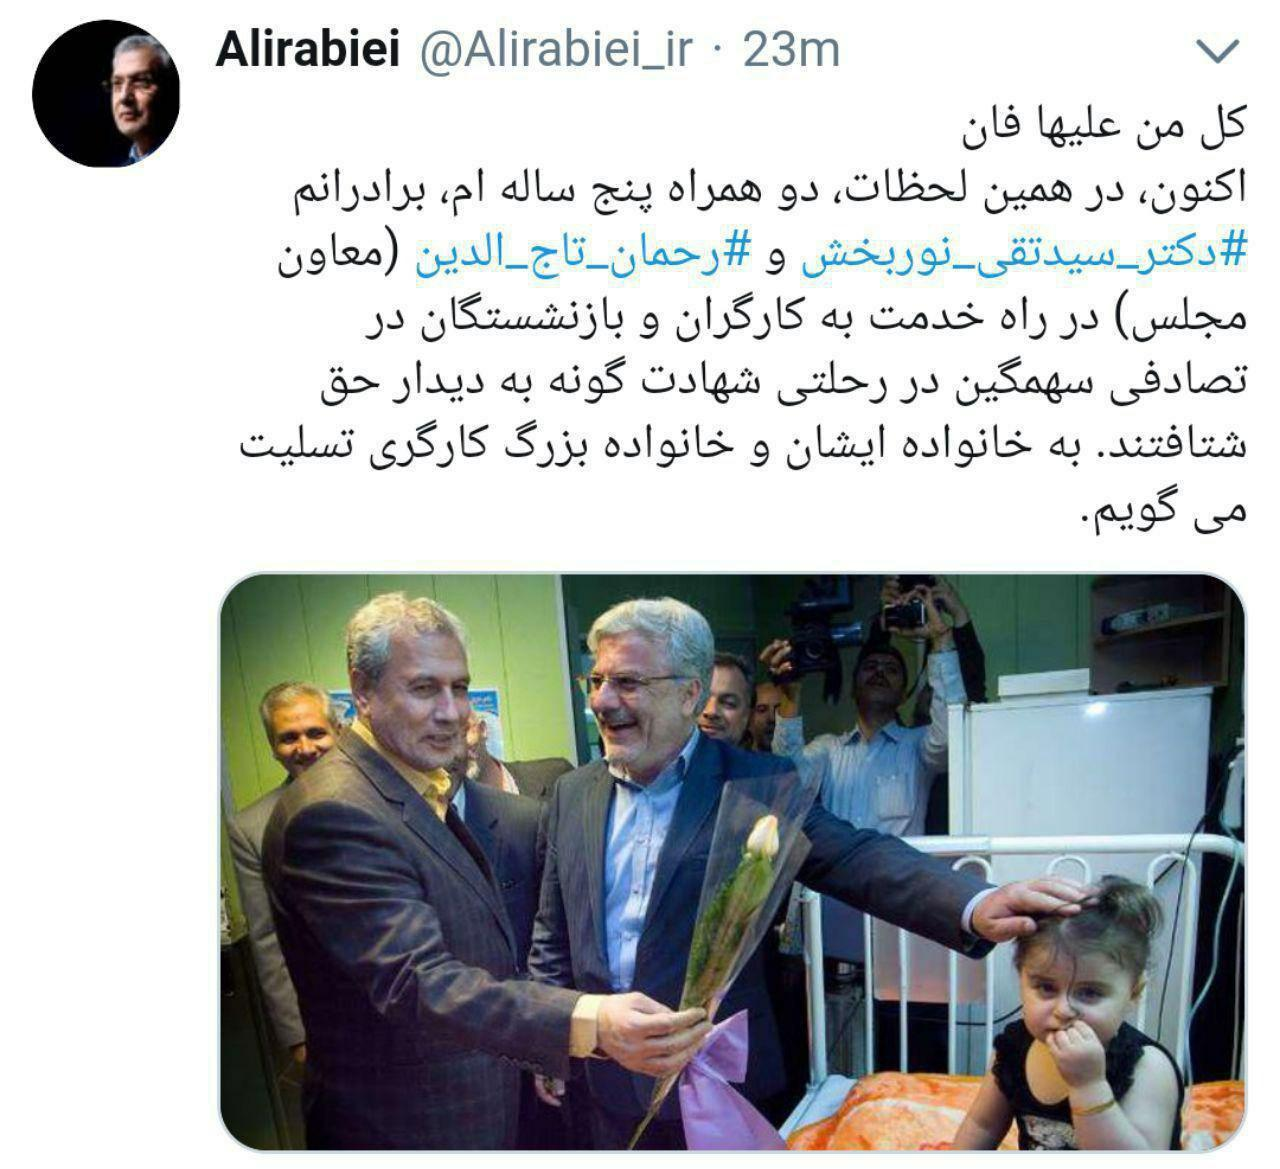 photo 2018 11 15 19 15 29 - واکنش ربیعی به درگذشت سیدتقی نوربخش